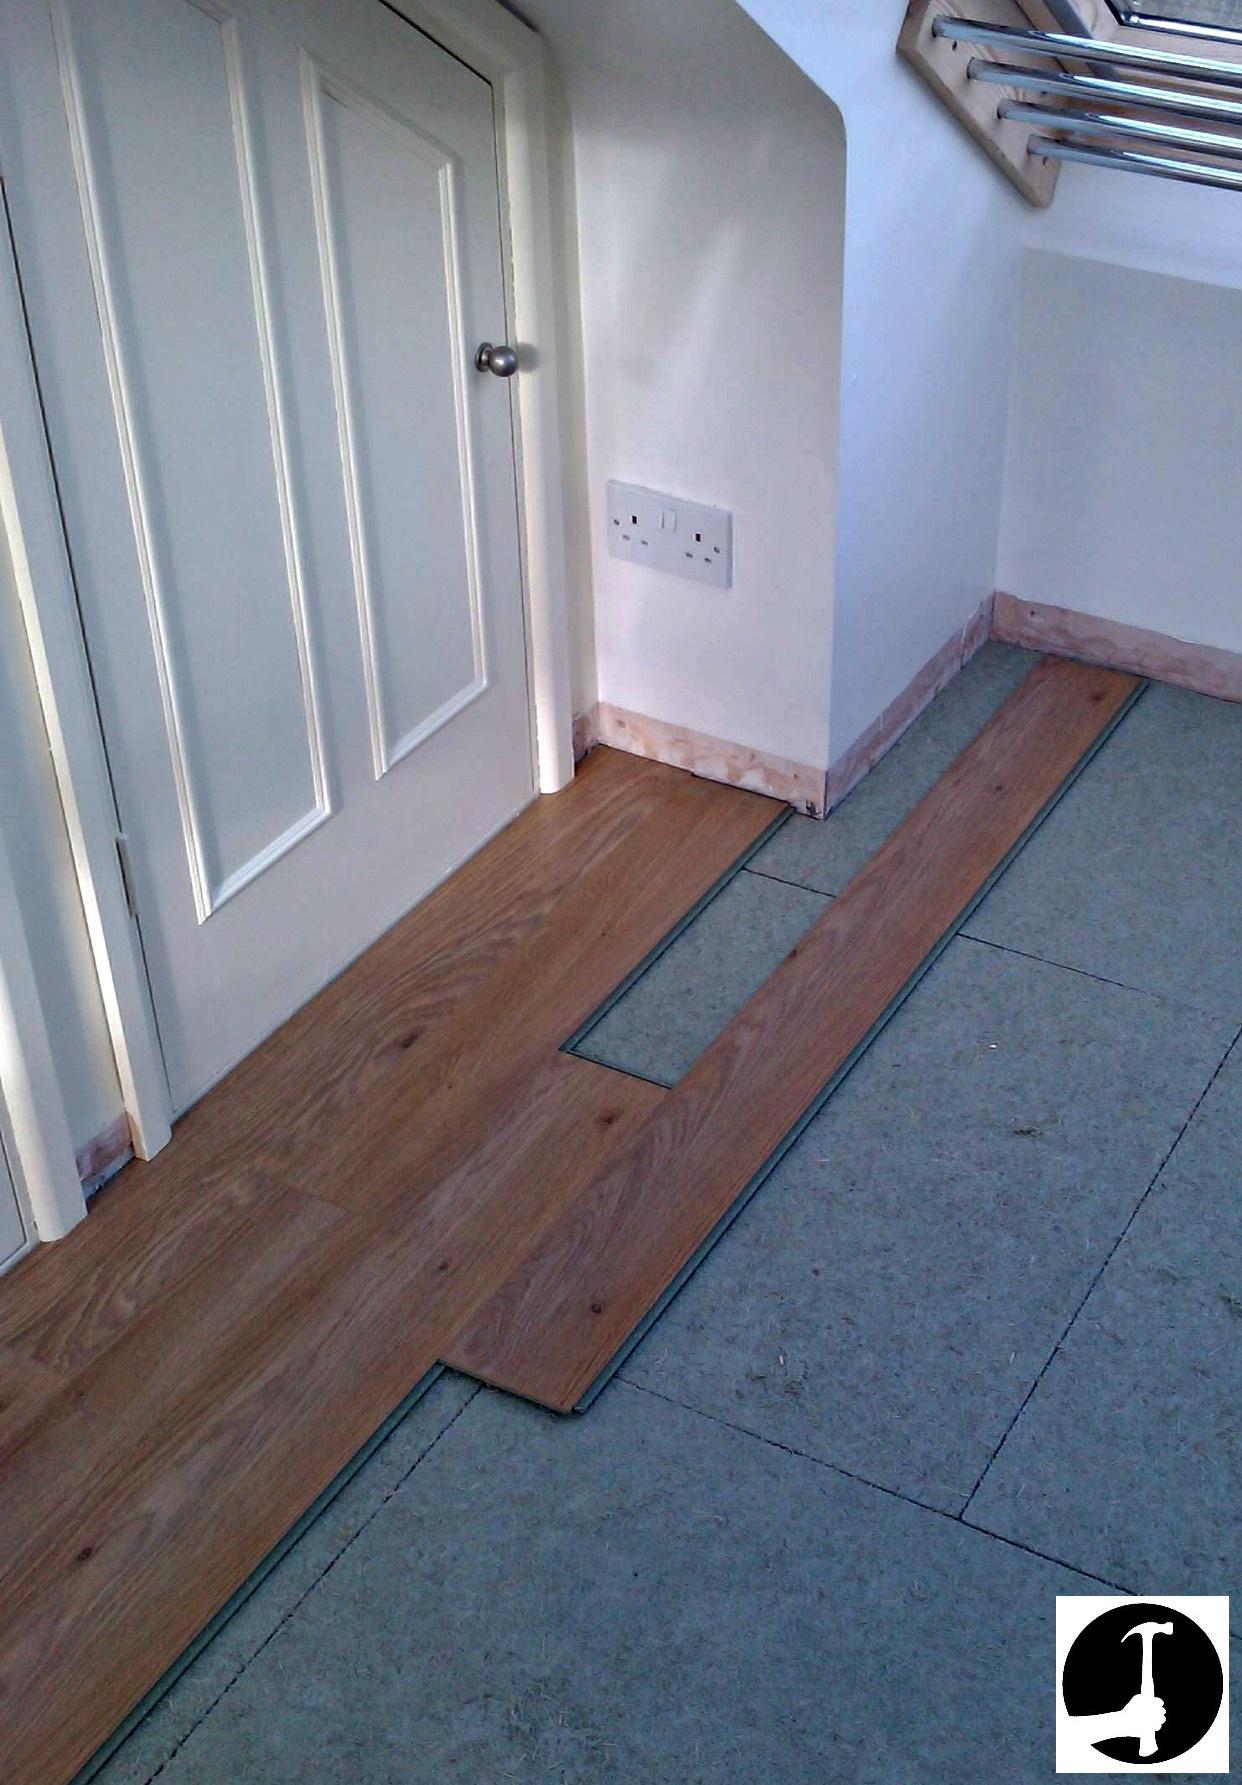 laying laminate flooring on concrete